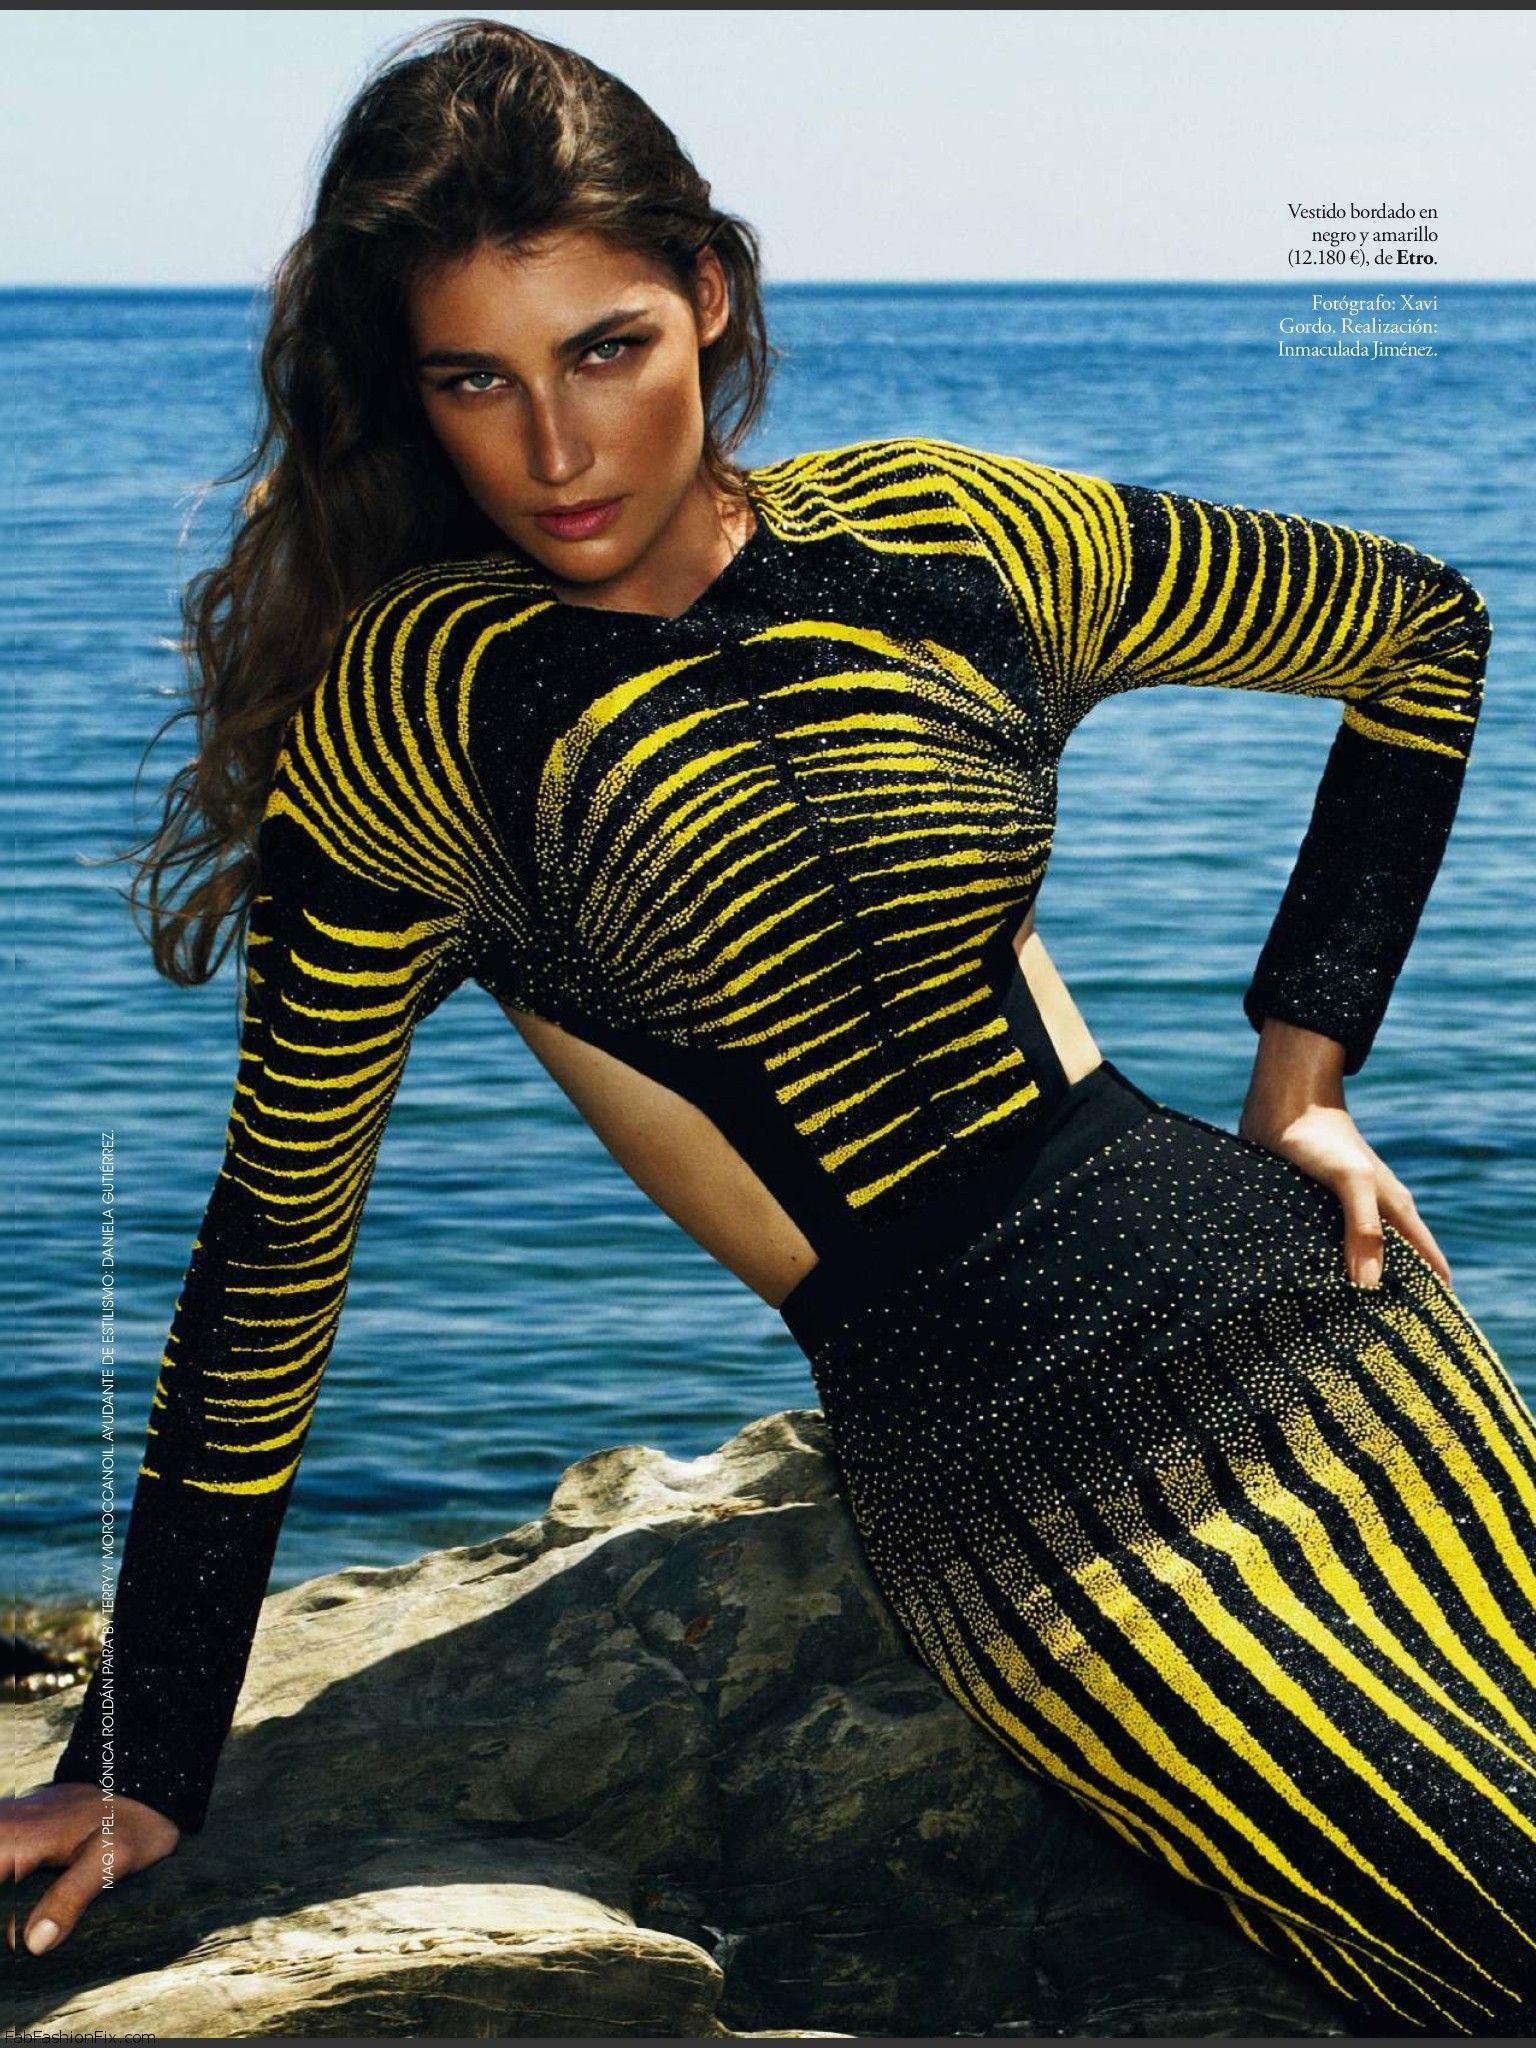 fashion_scans_remastered-eugenia_volodina-elle_espana-september_2013-scanned_by_vampirehorde-hq-27